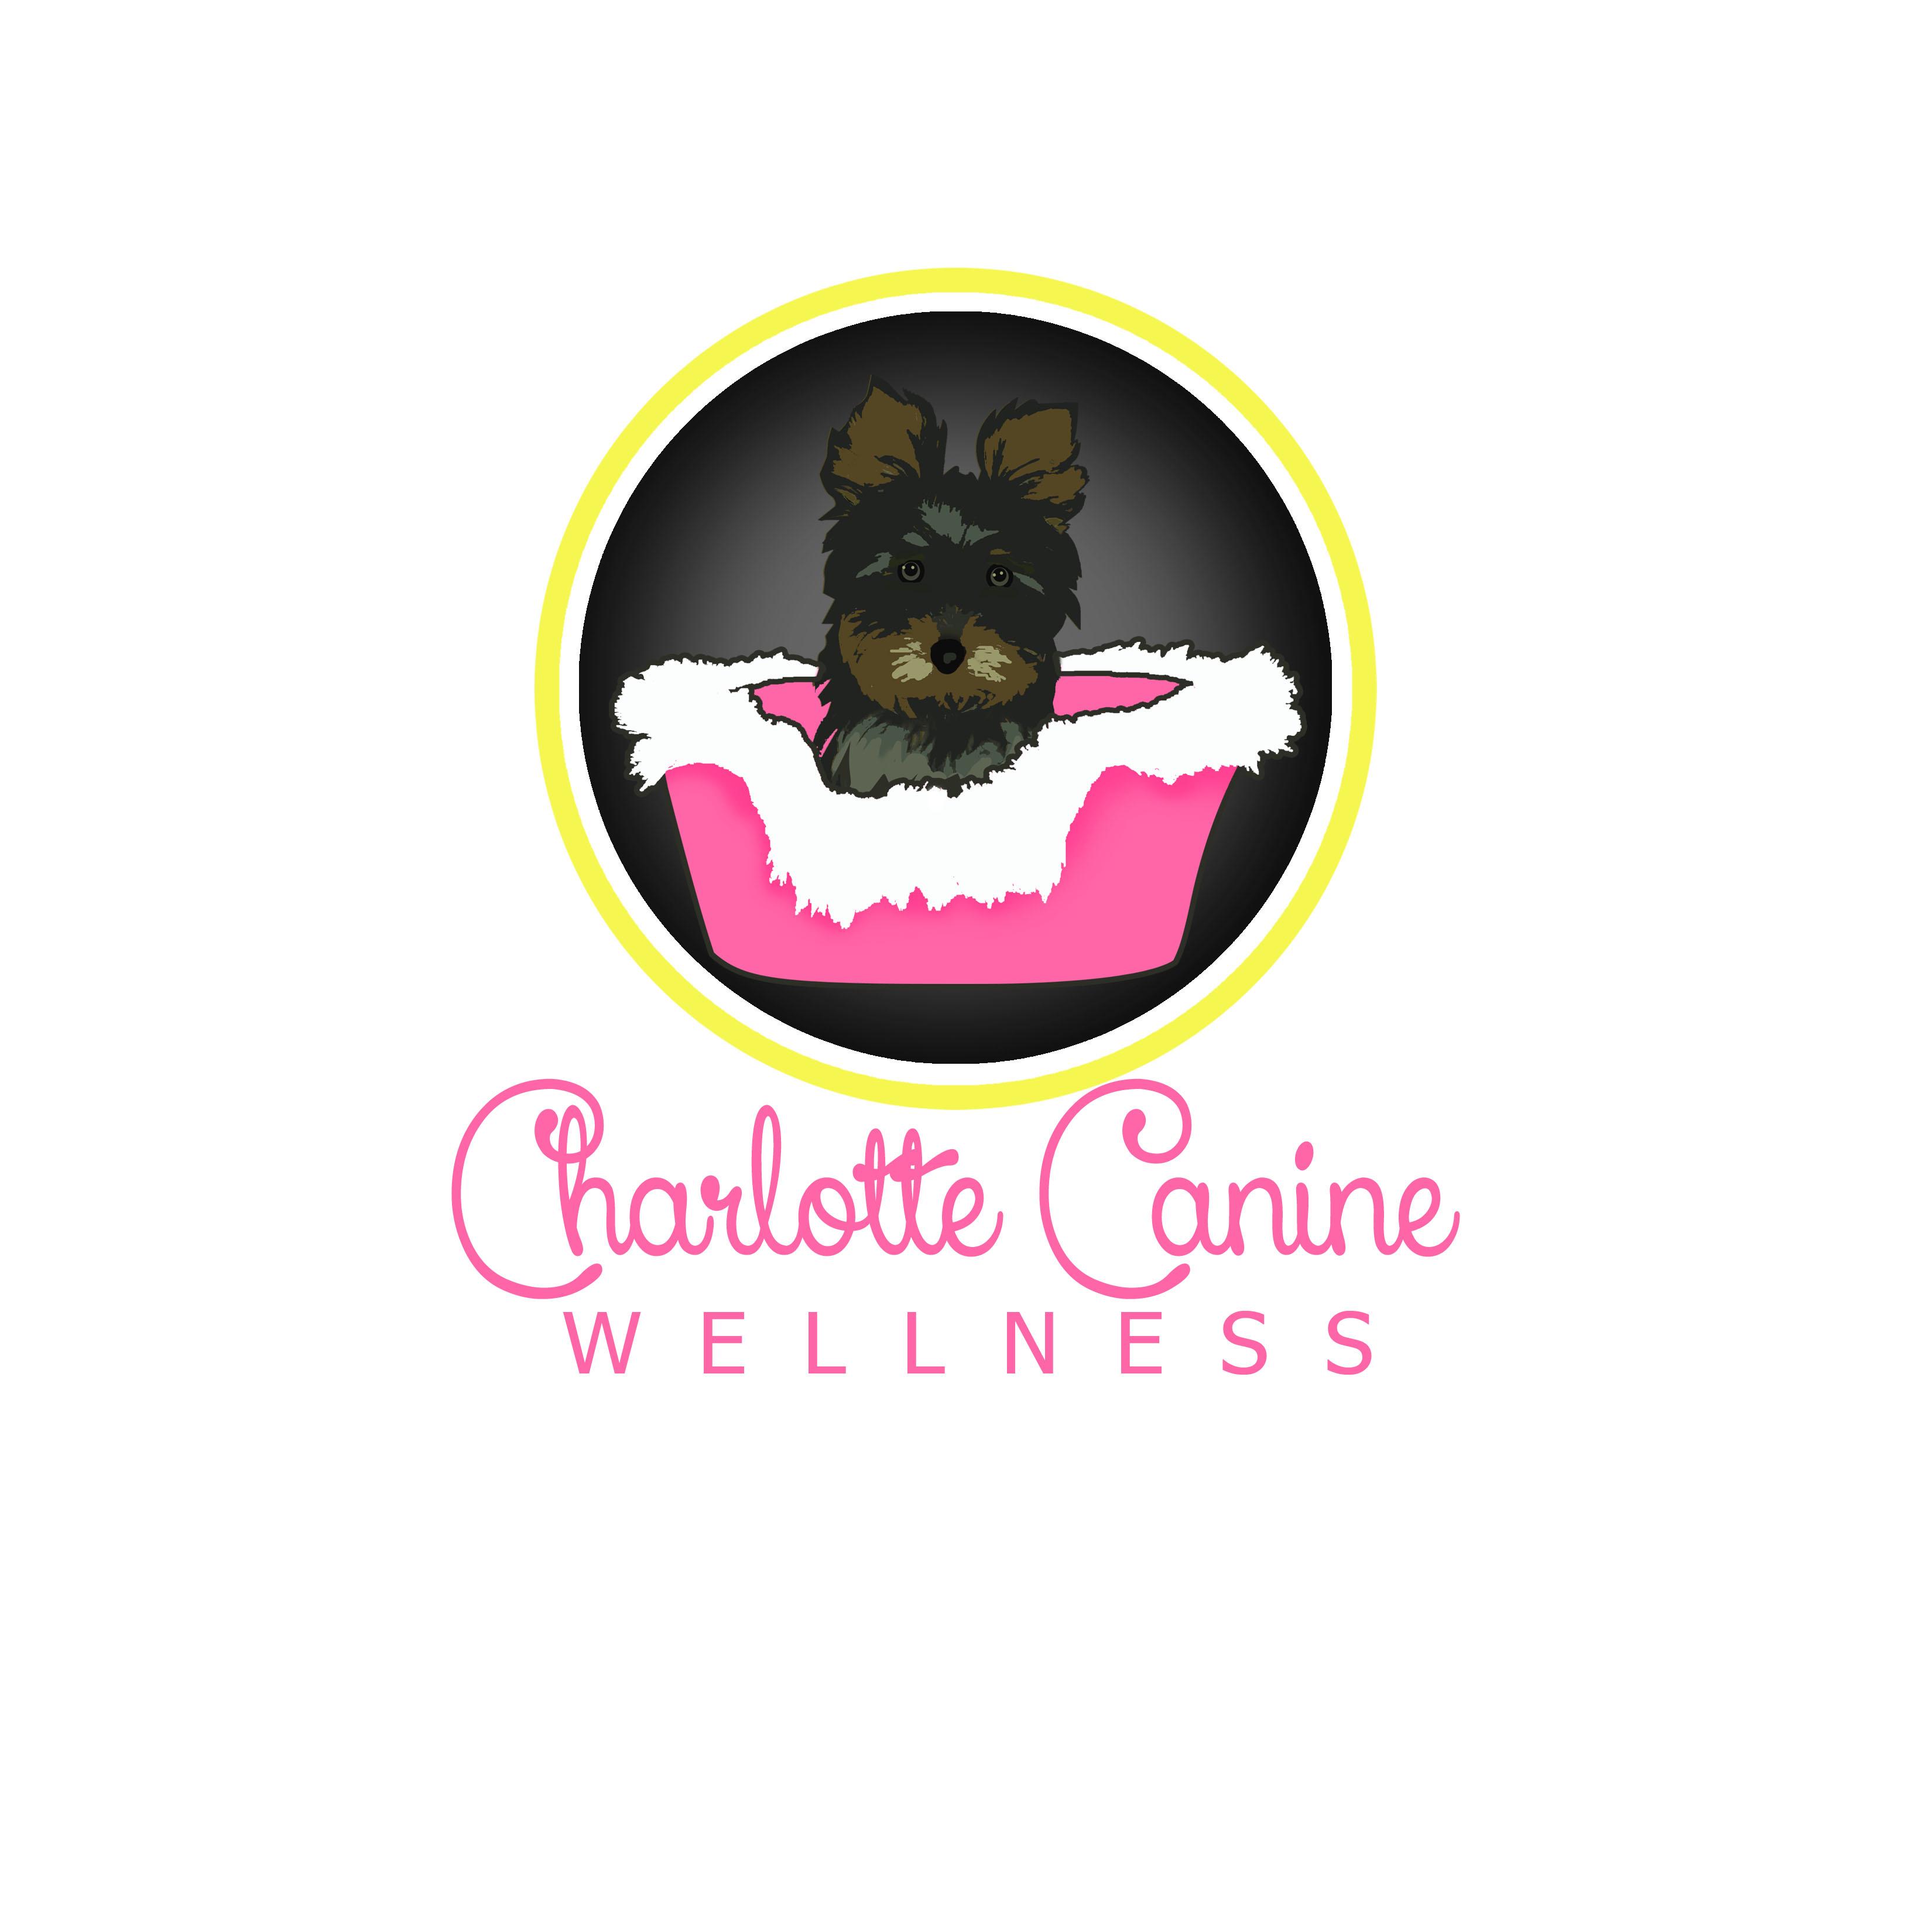 Logo Design by Allan Esclamado - Entry No. 68 in the Logo Design Contest New Logo Design for Charlotte Canine Wellness.